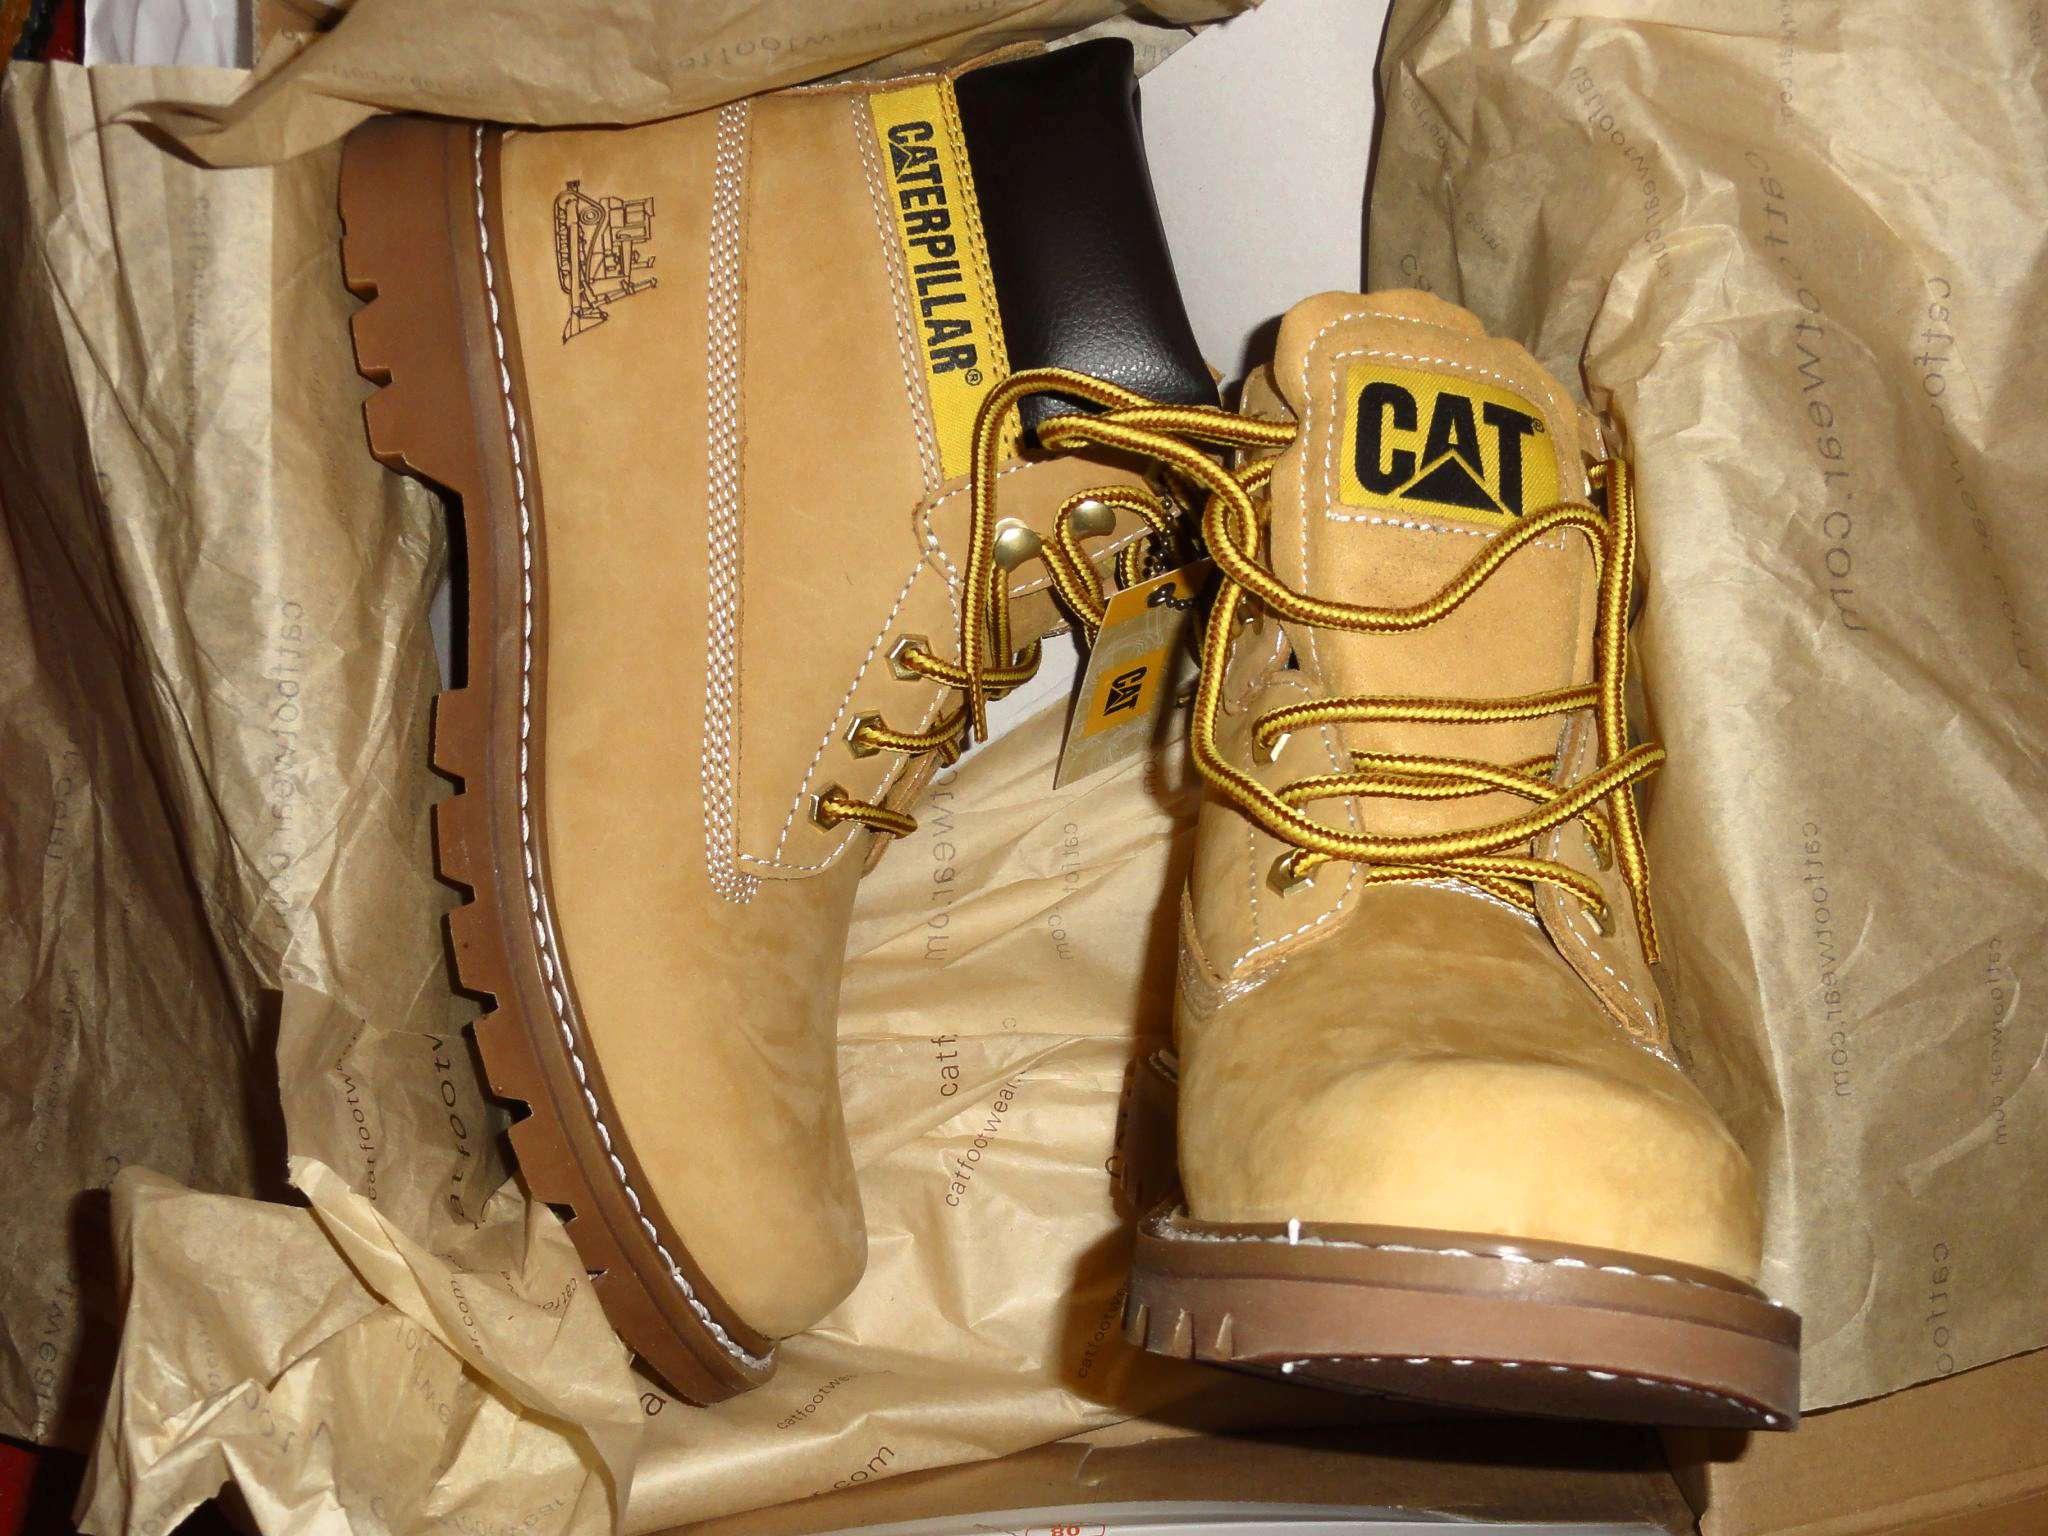 d3df72fad Ботинки Caterpillar COLORADO Men's Boots 44100 мужские, цвет желтый ...